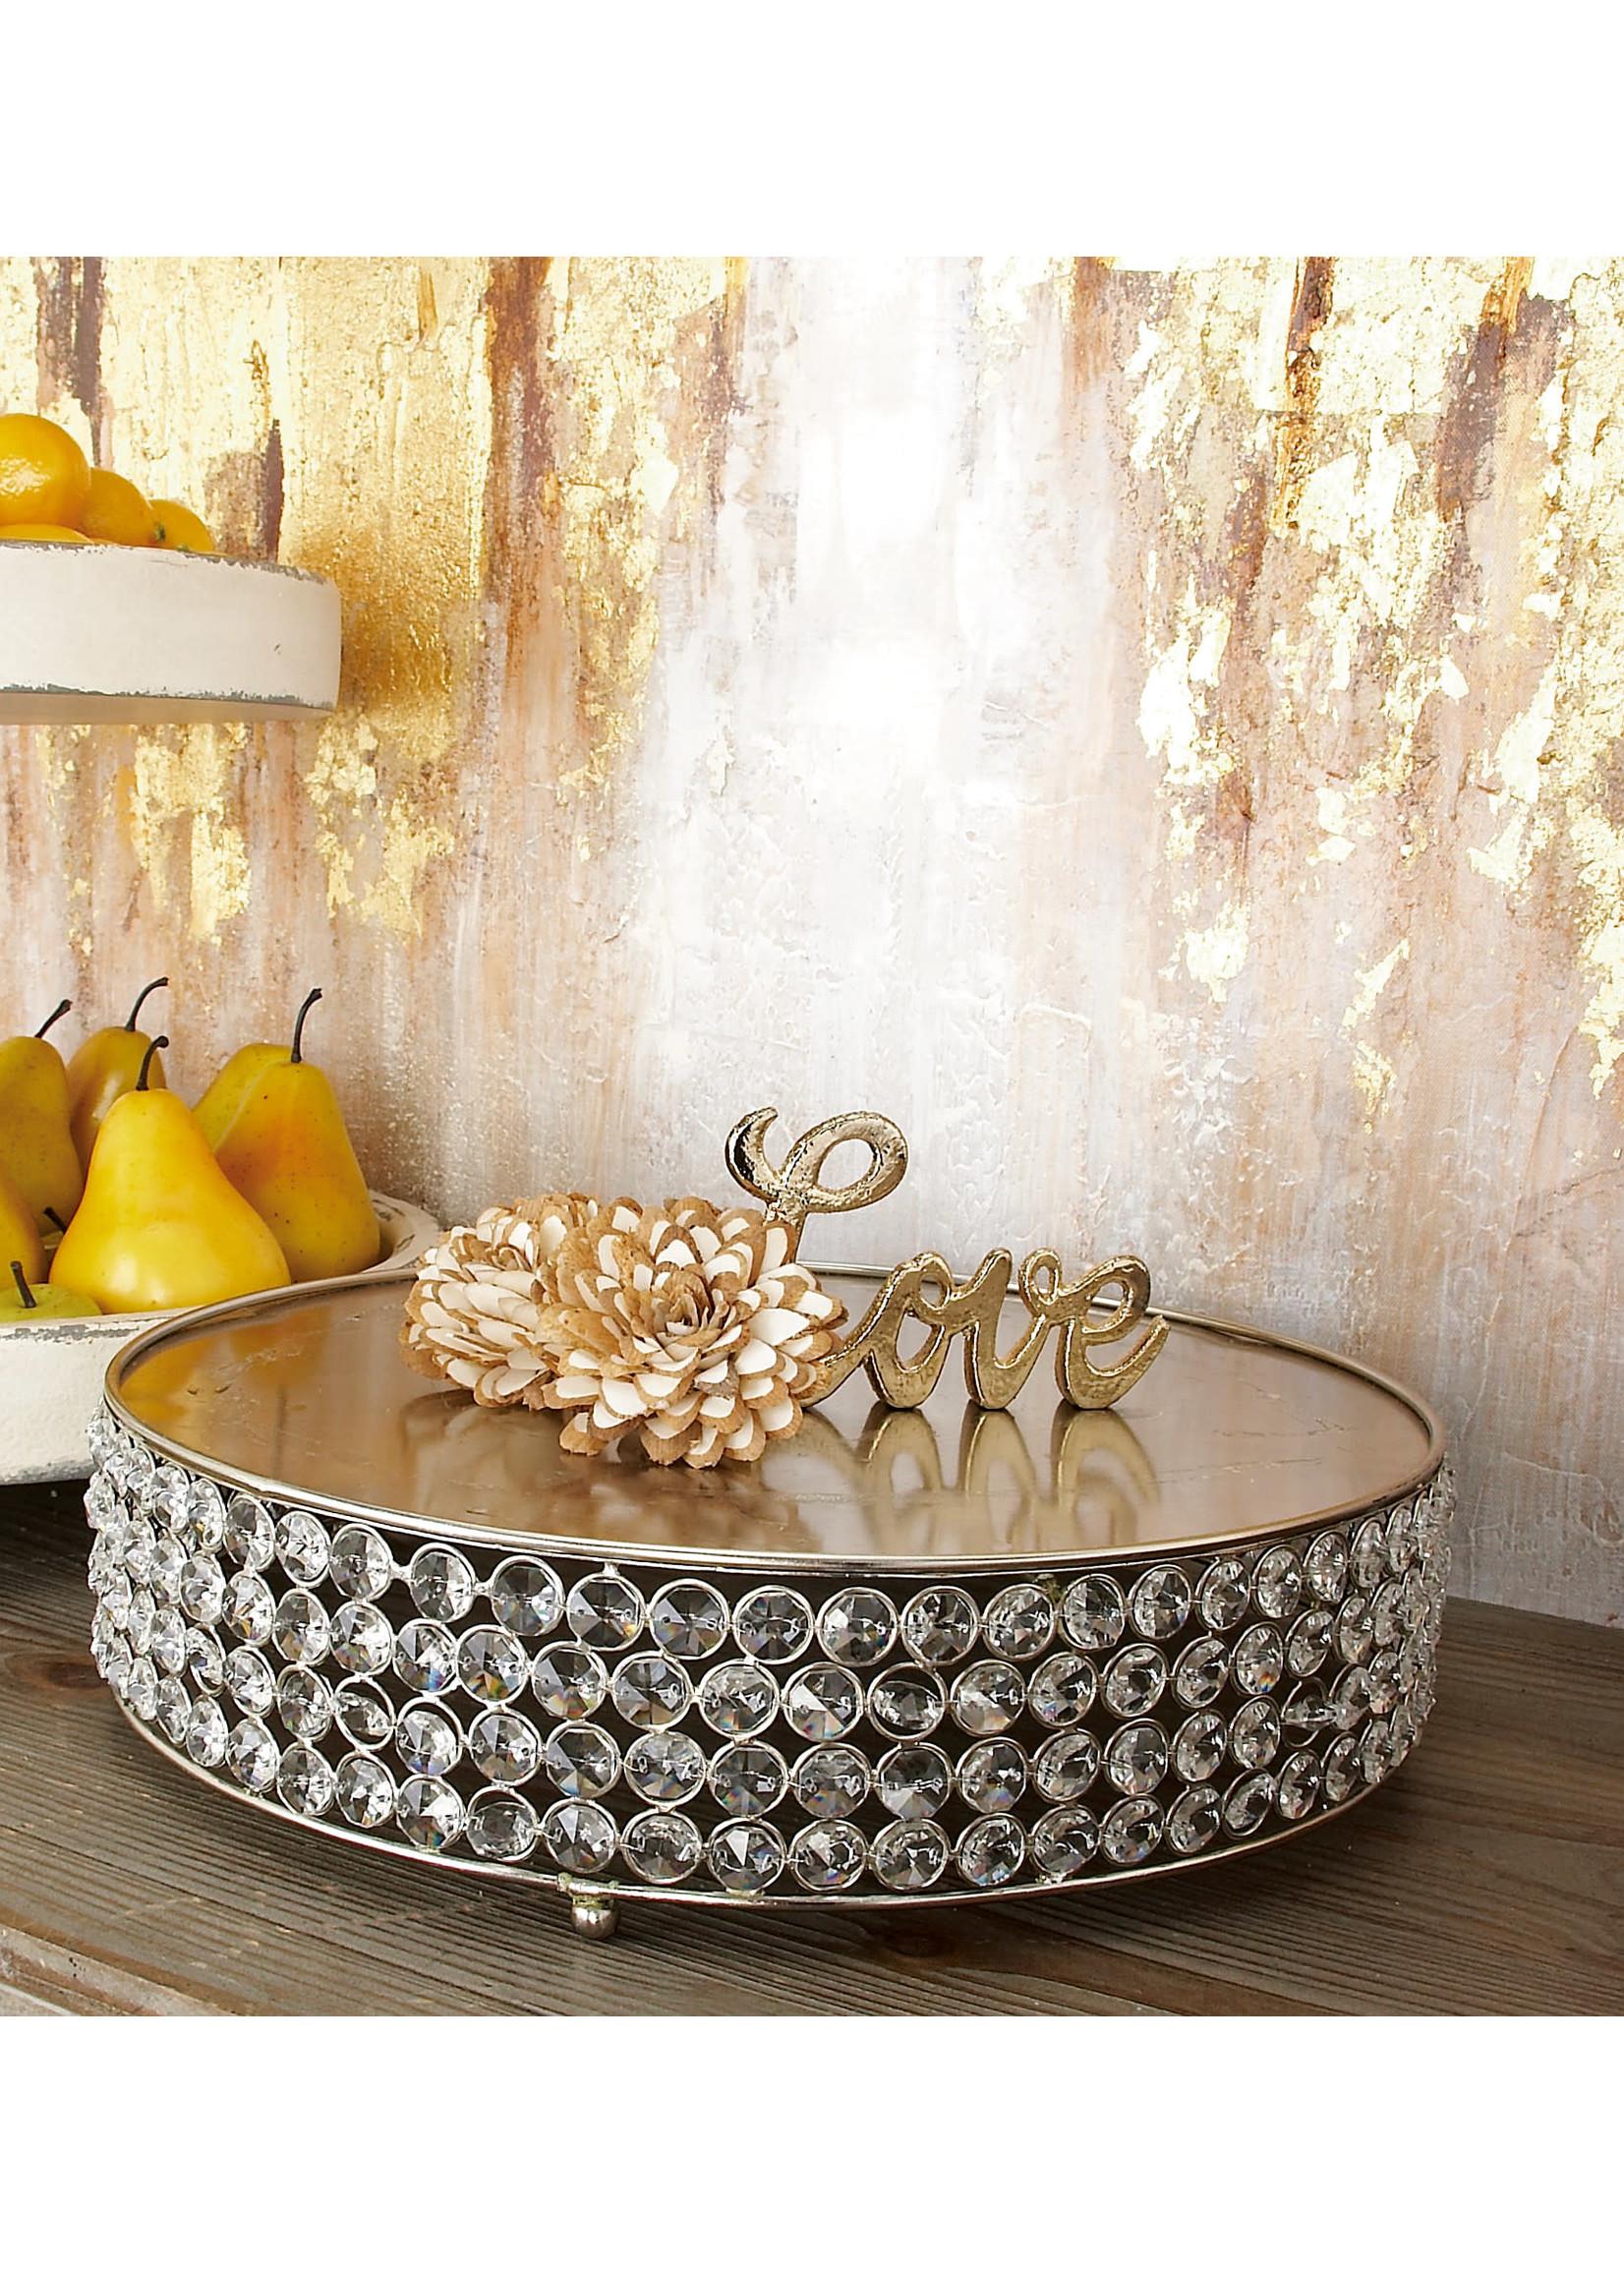 UMA Enterprises Metal Bead Cake Stand - Large